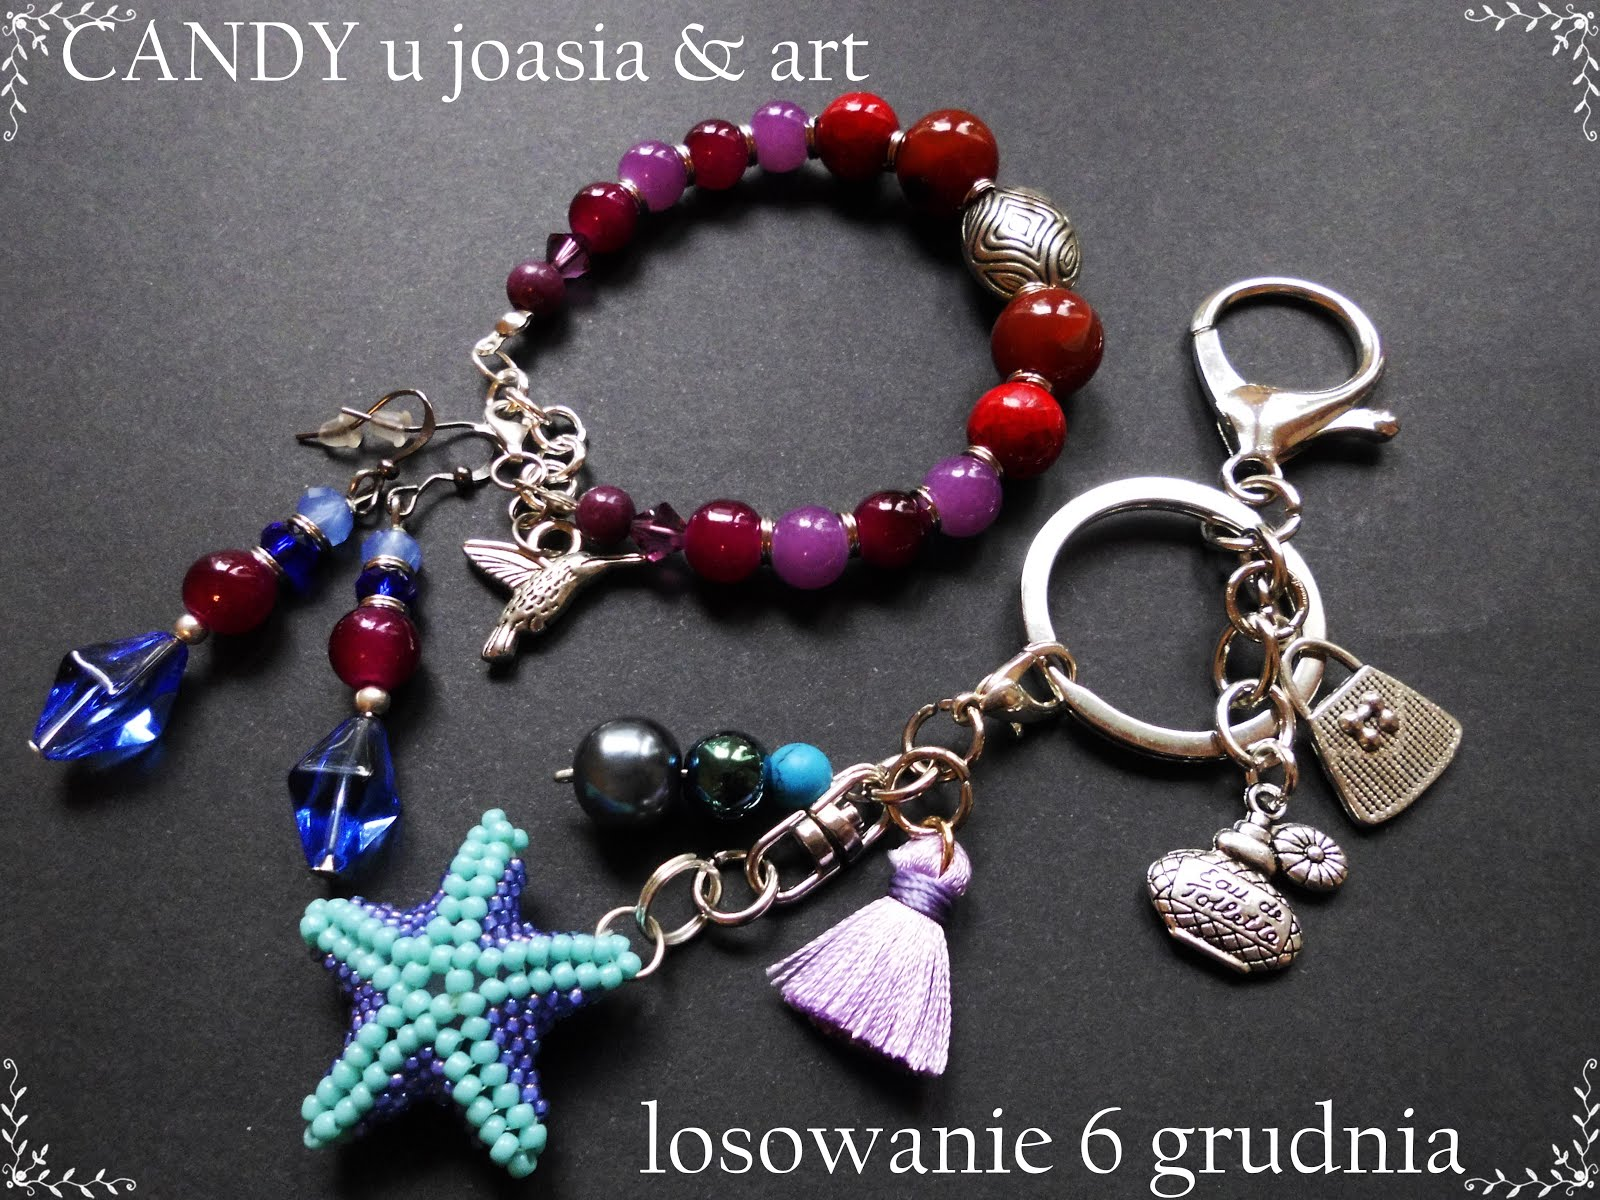 "candy w"" JOASIA&ART"""